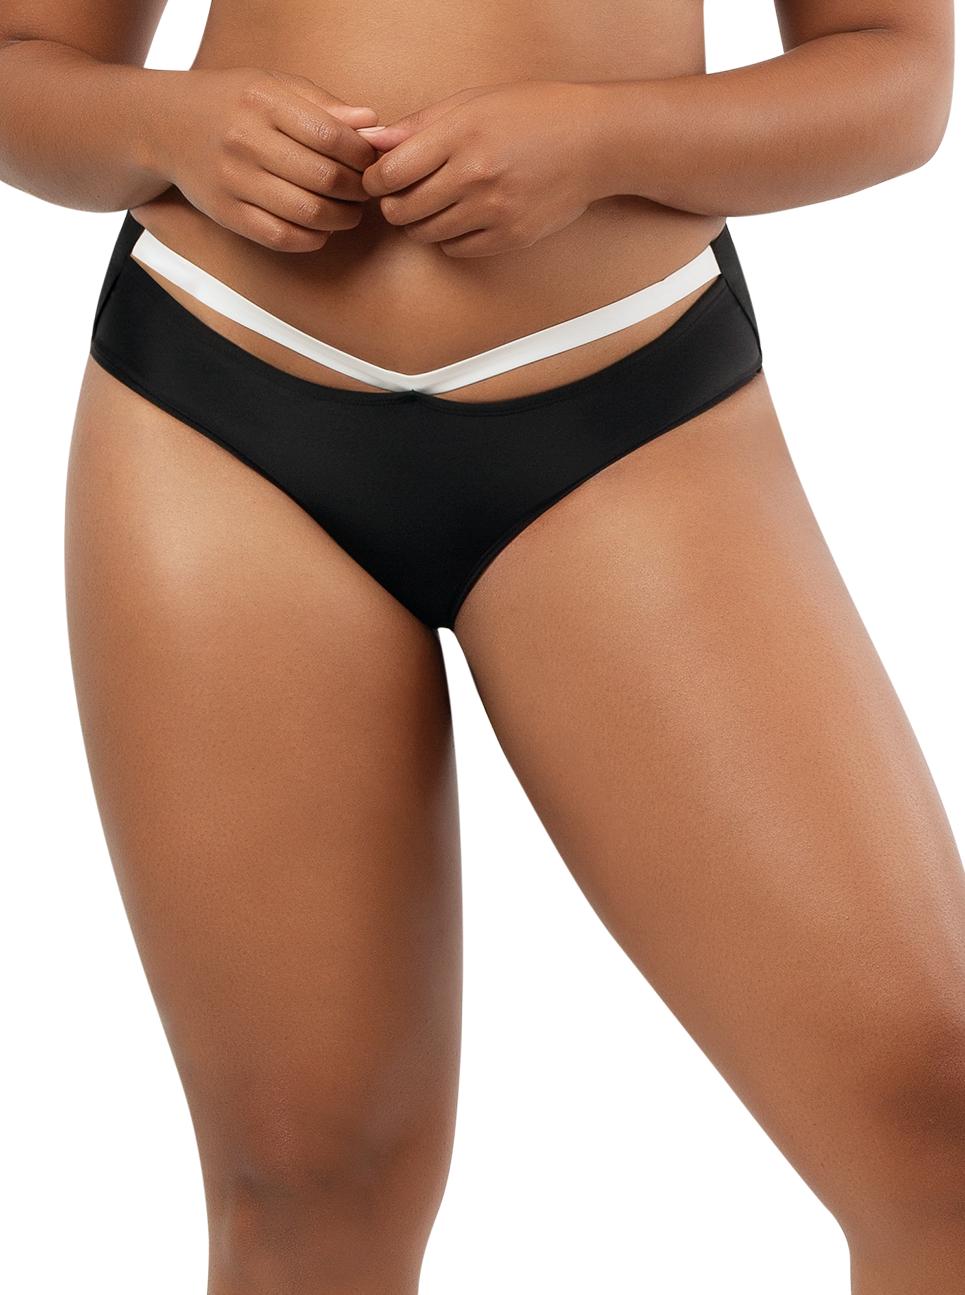 PARFAIT Lauren HighwaistBikiniBottomS8223 BlackWWhite Front - Lauren Highwaisted Bikini Bottom Black w White S8223